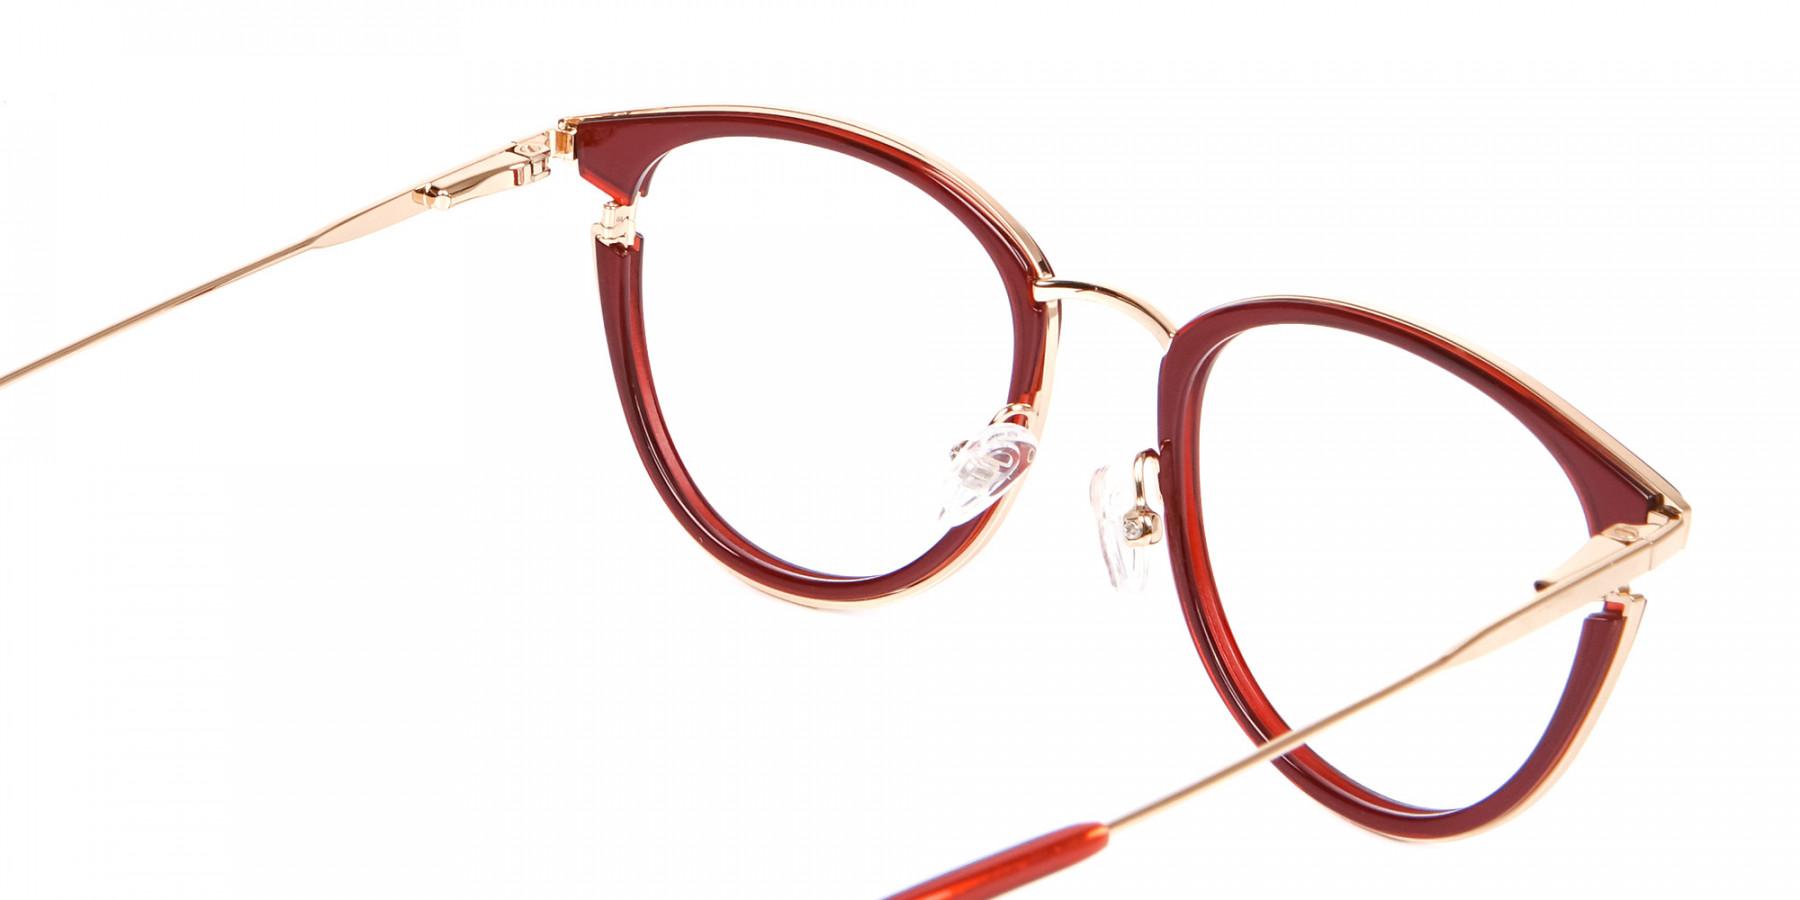 Unisex 50's Round Cat-eye Frame in Red & Gold-1